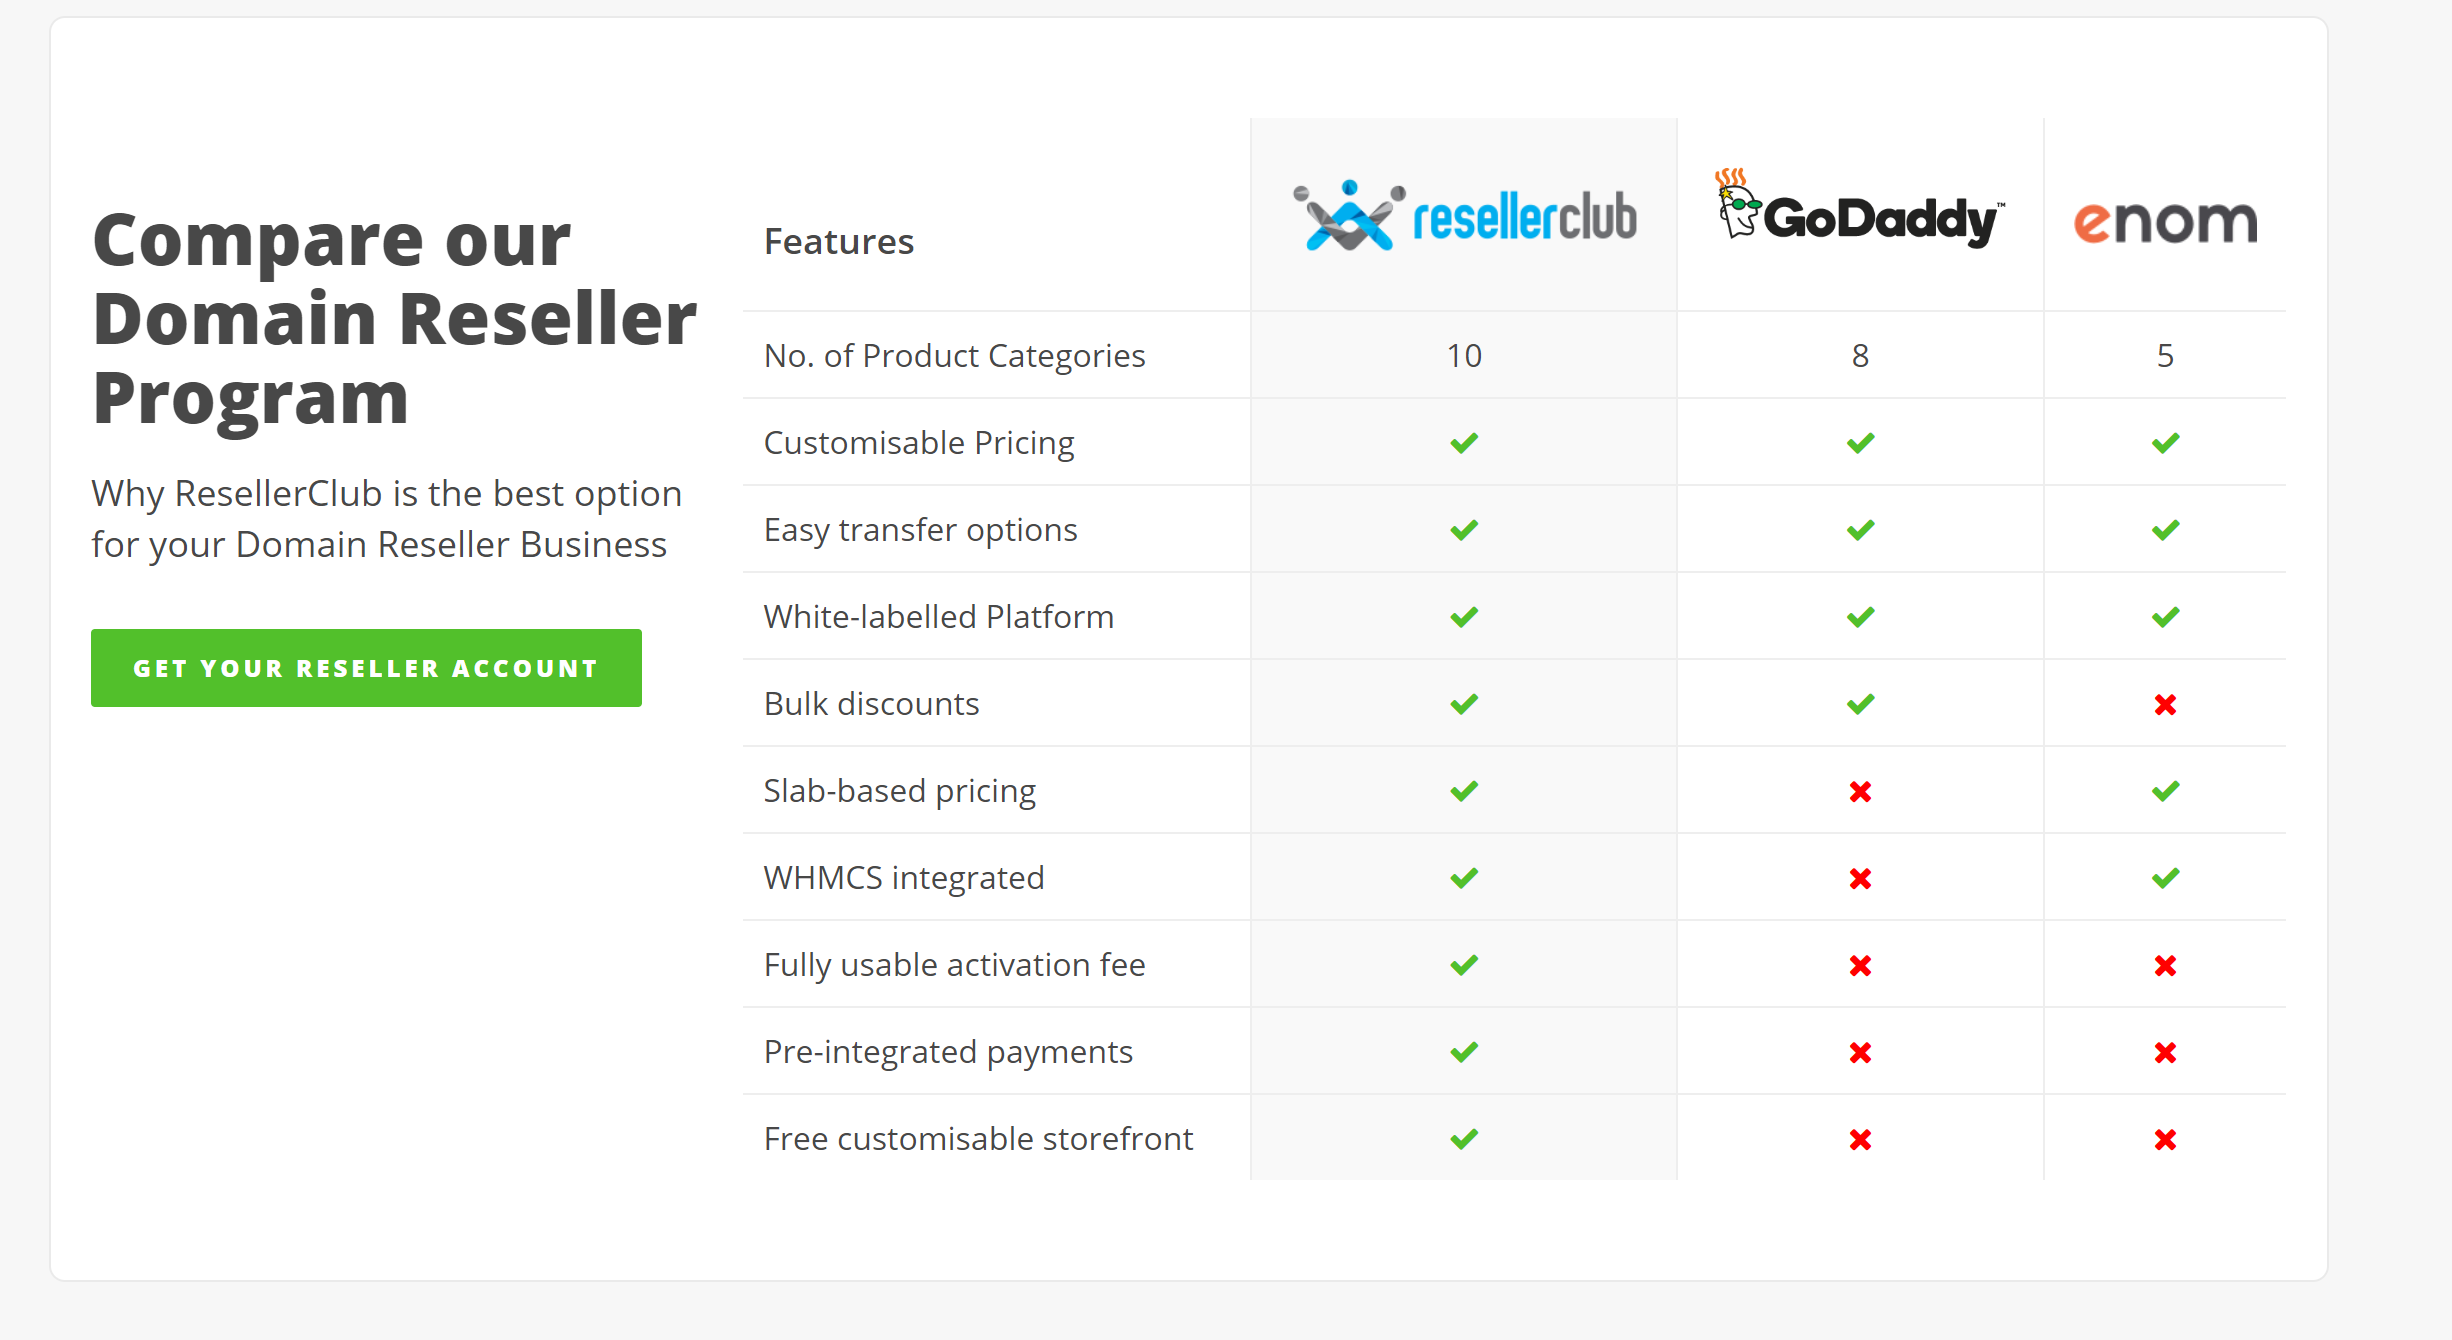 ResellerClub Domain Pricing reviews